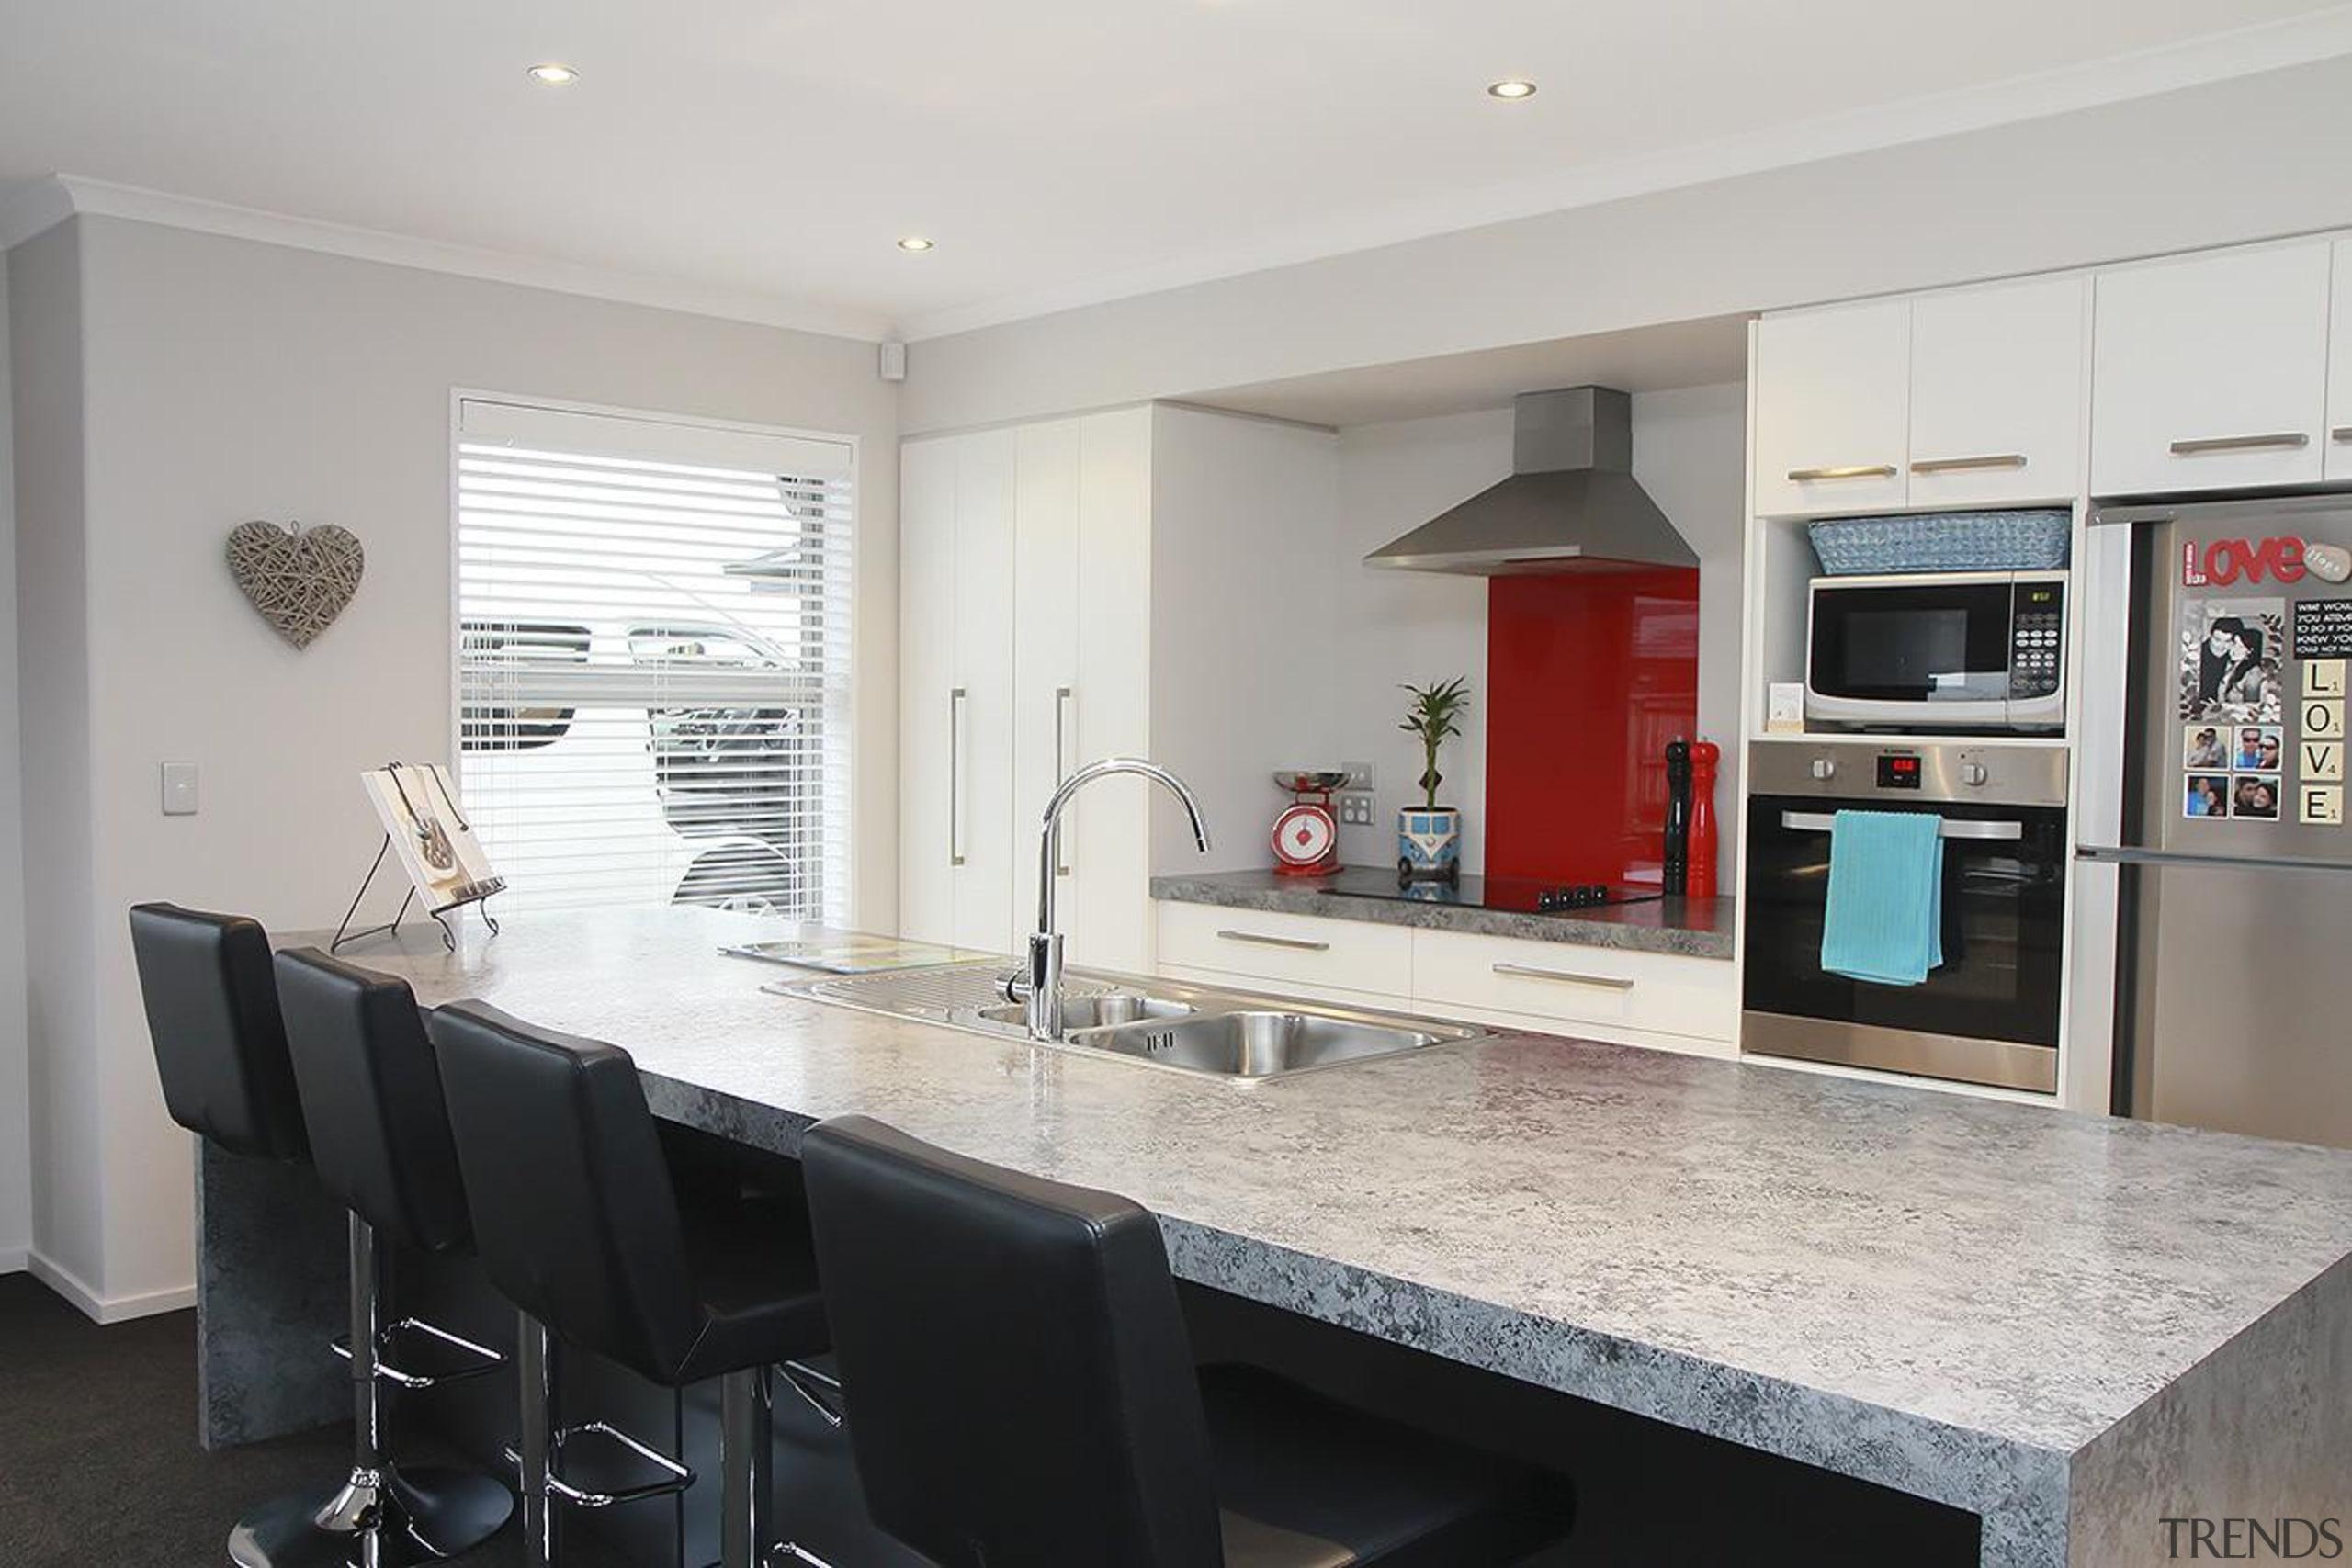 For more information, please visit www.gjgardner.co.nz countertop, interior design, kitchen, property, real estate, gray